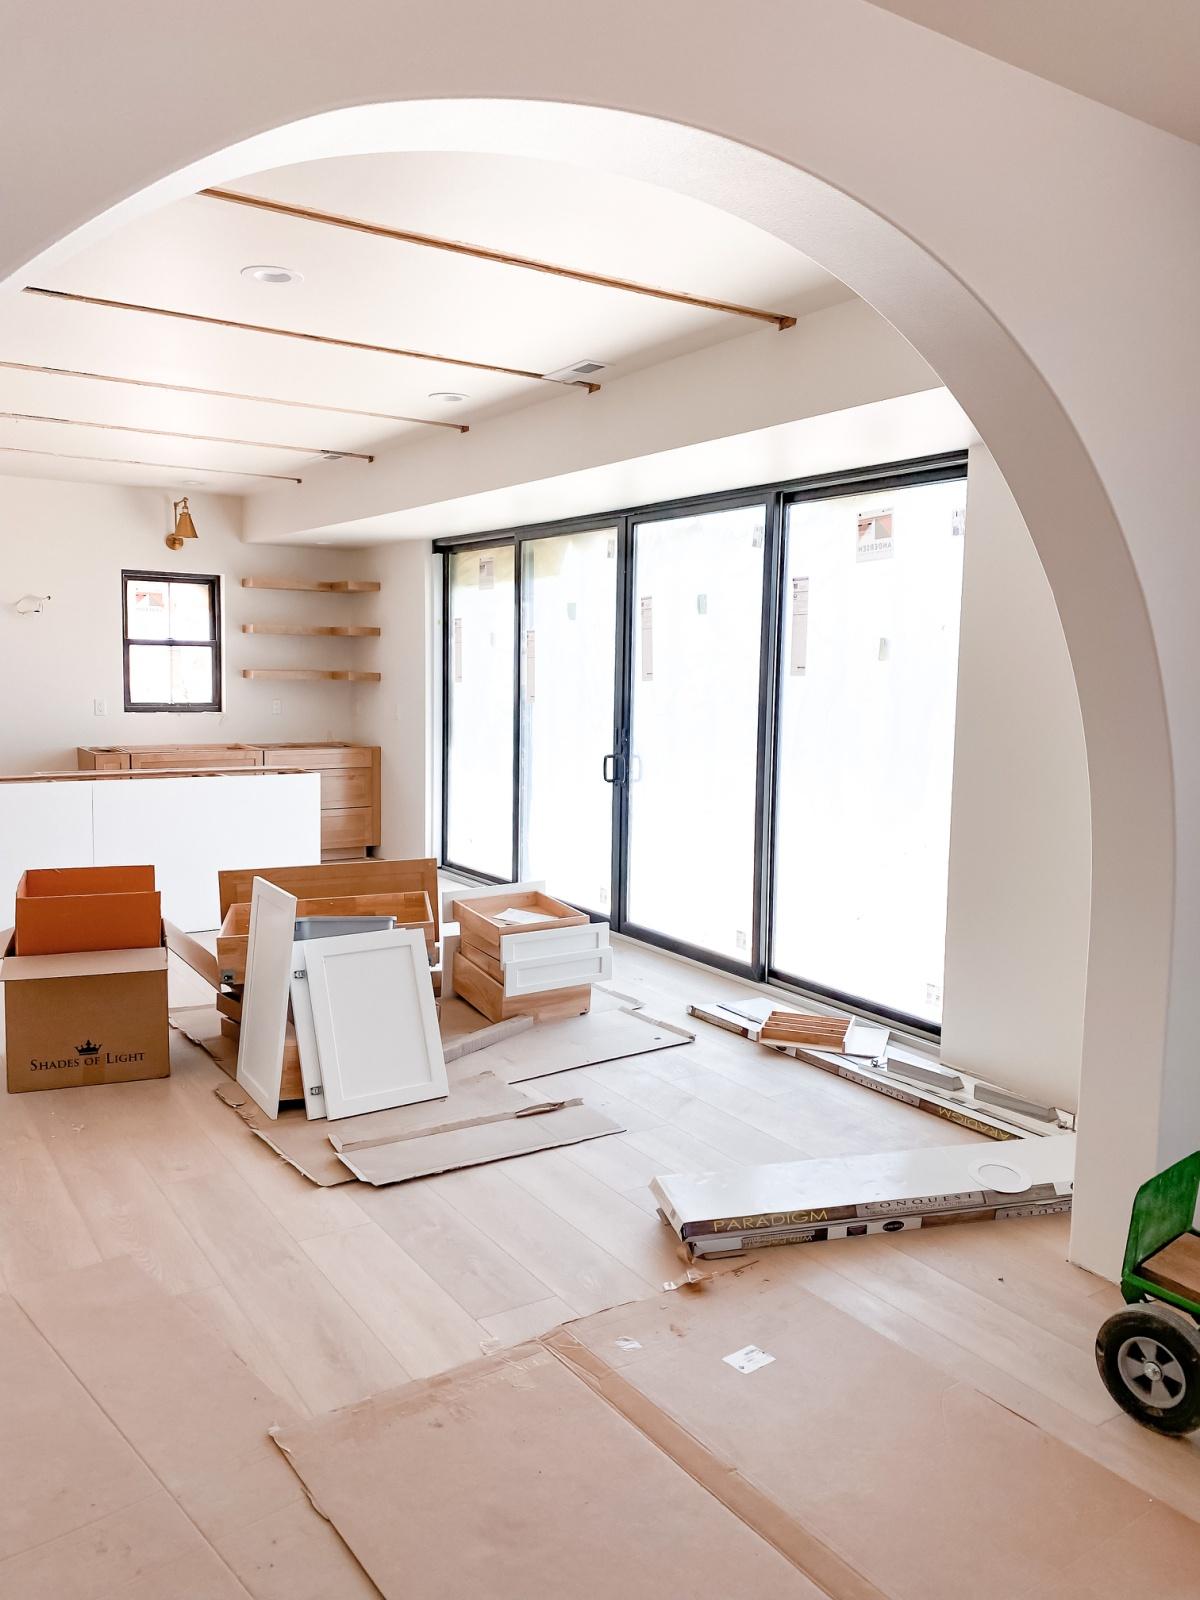 build update 7: Lake chelan home european farmhouse exterior design rectangle farmhouse